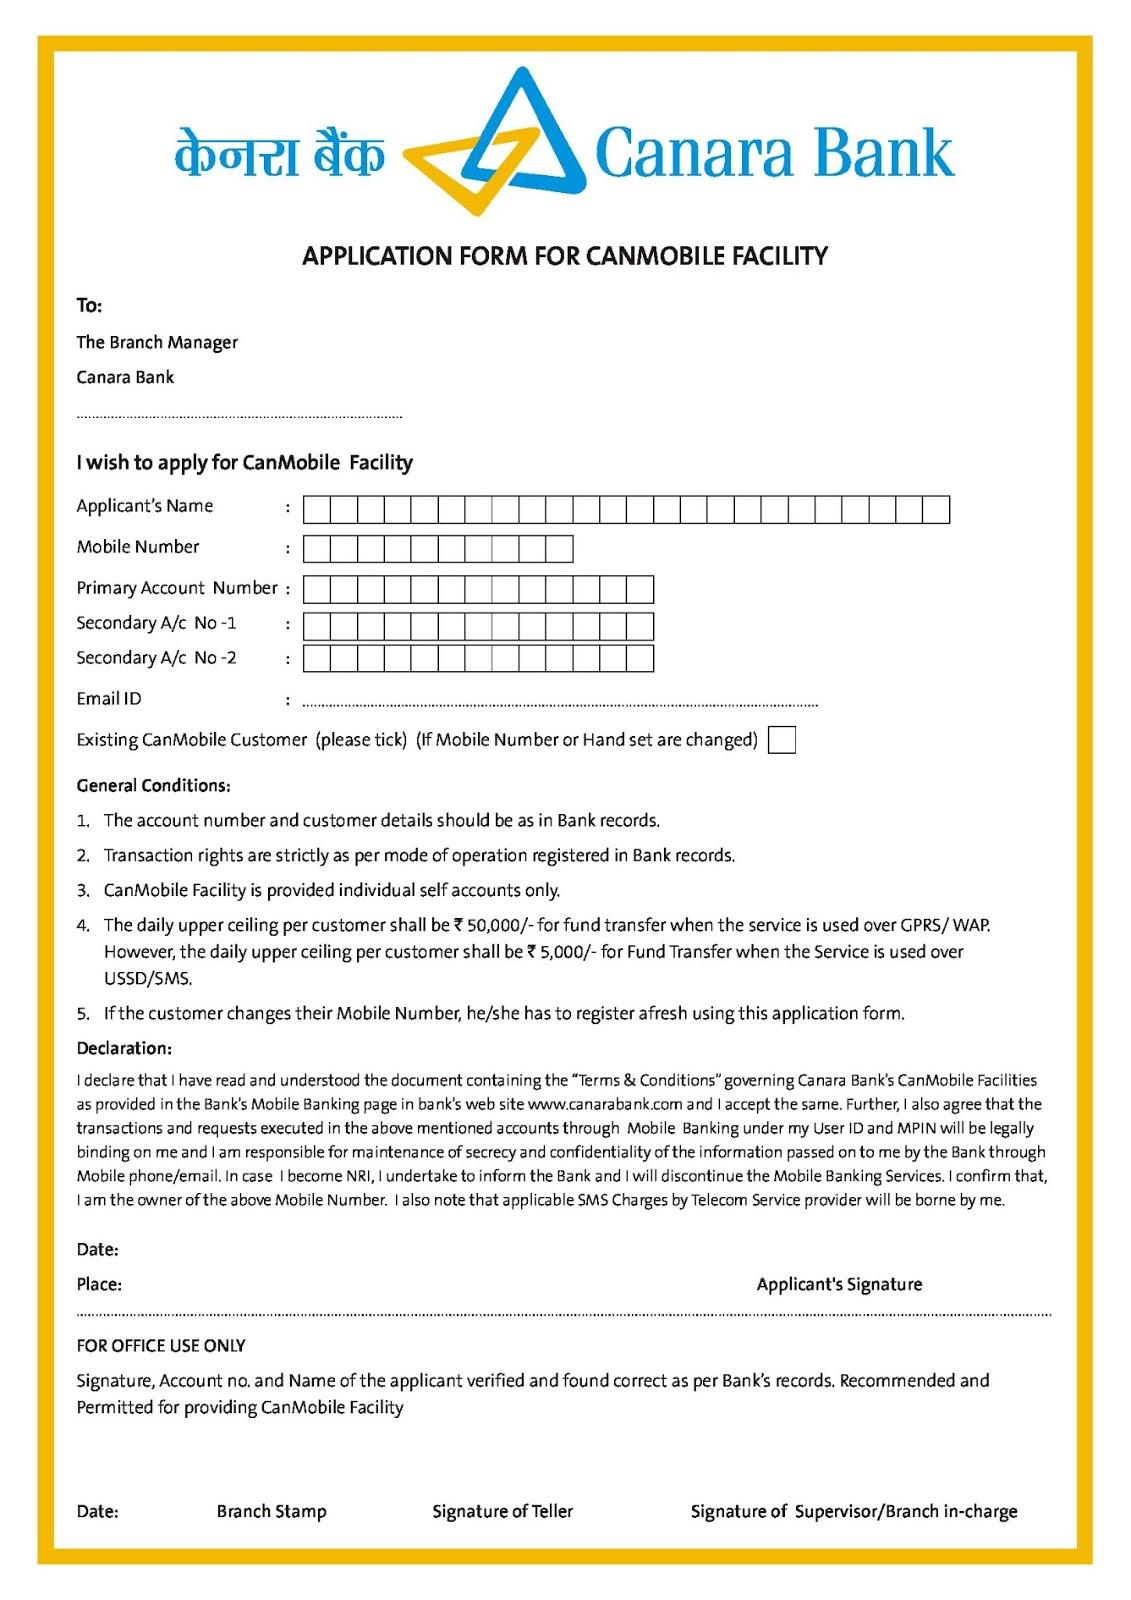 Canara Bank Travel Card Form